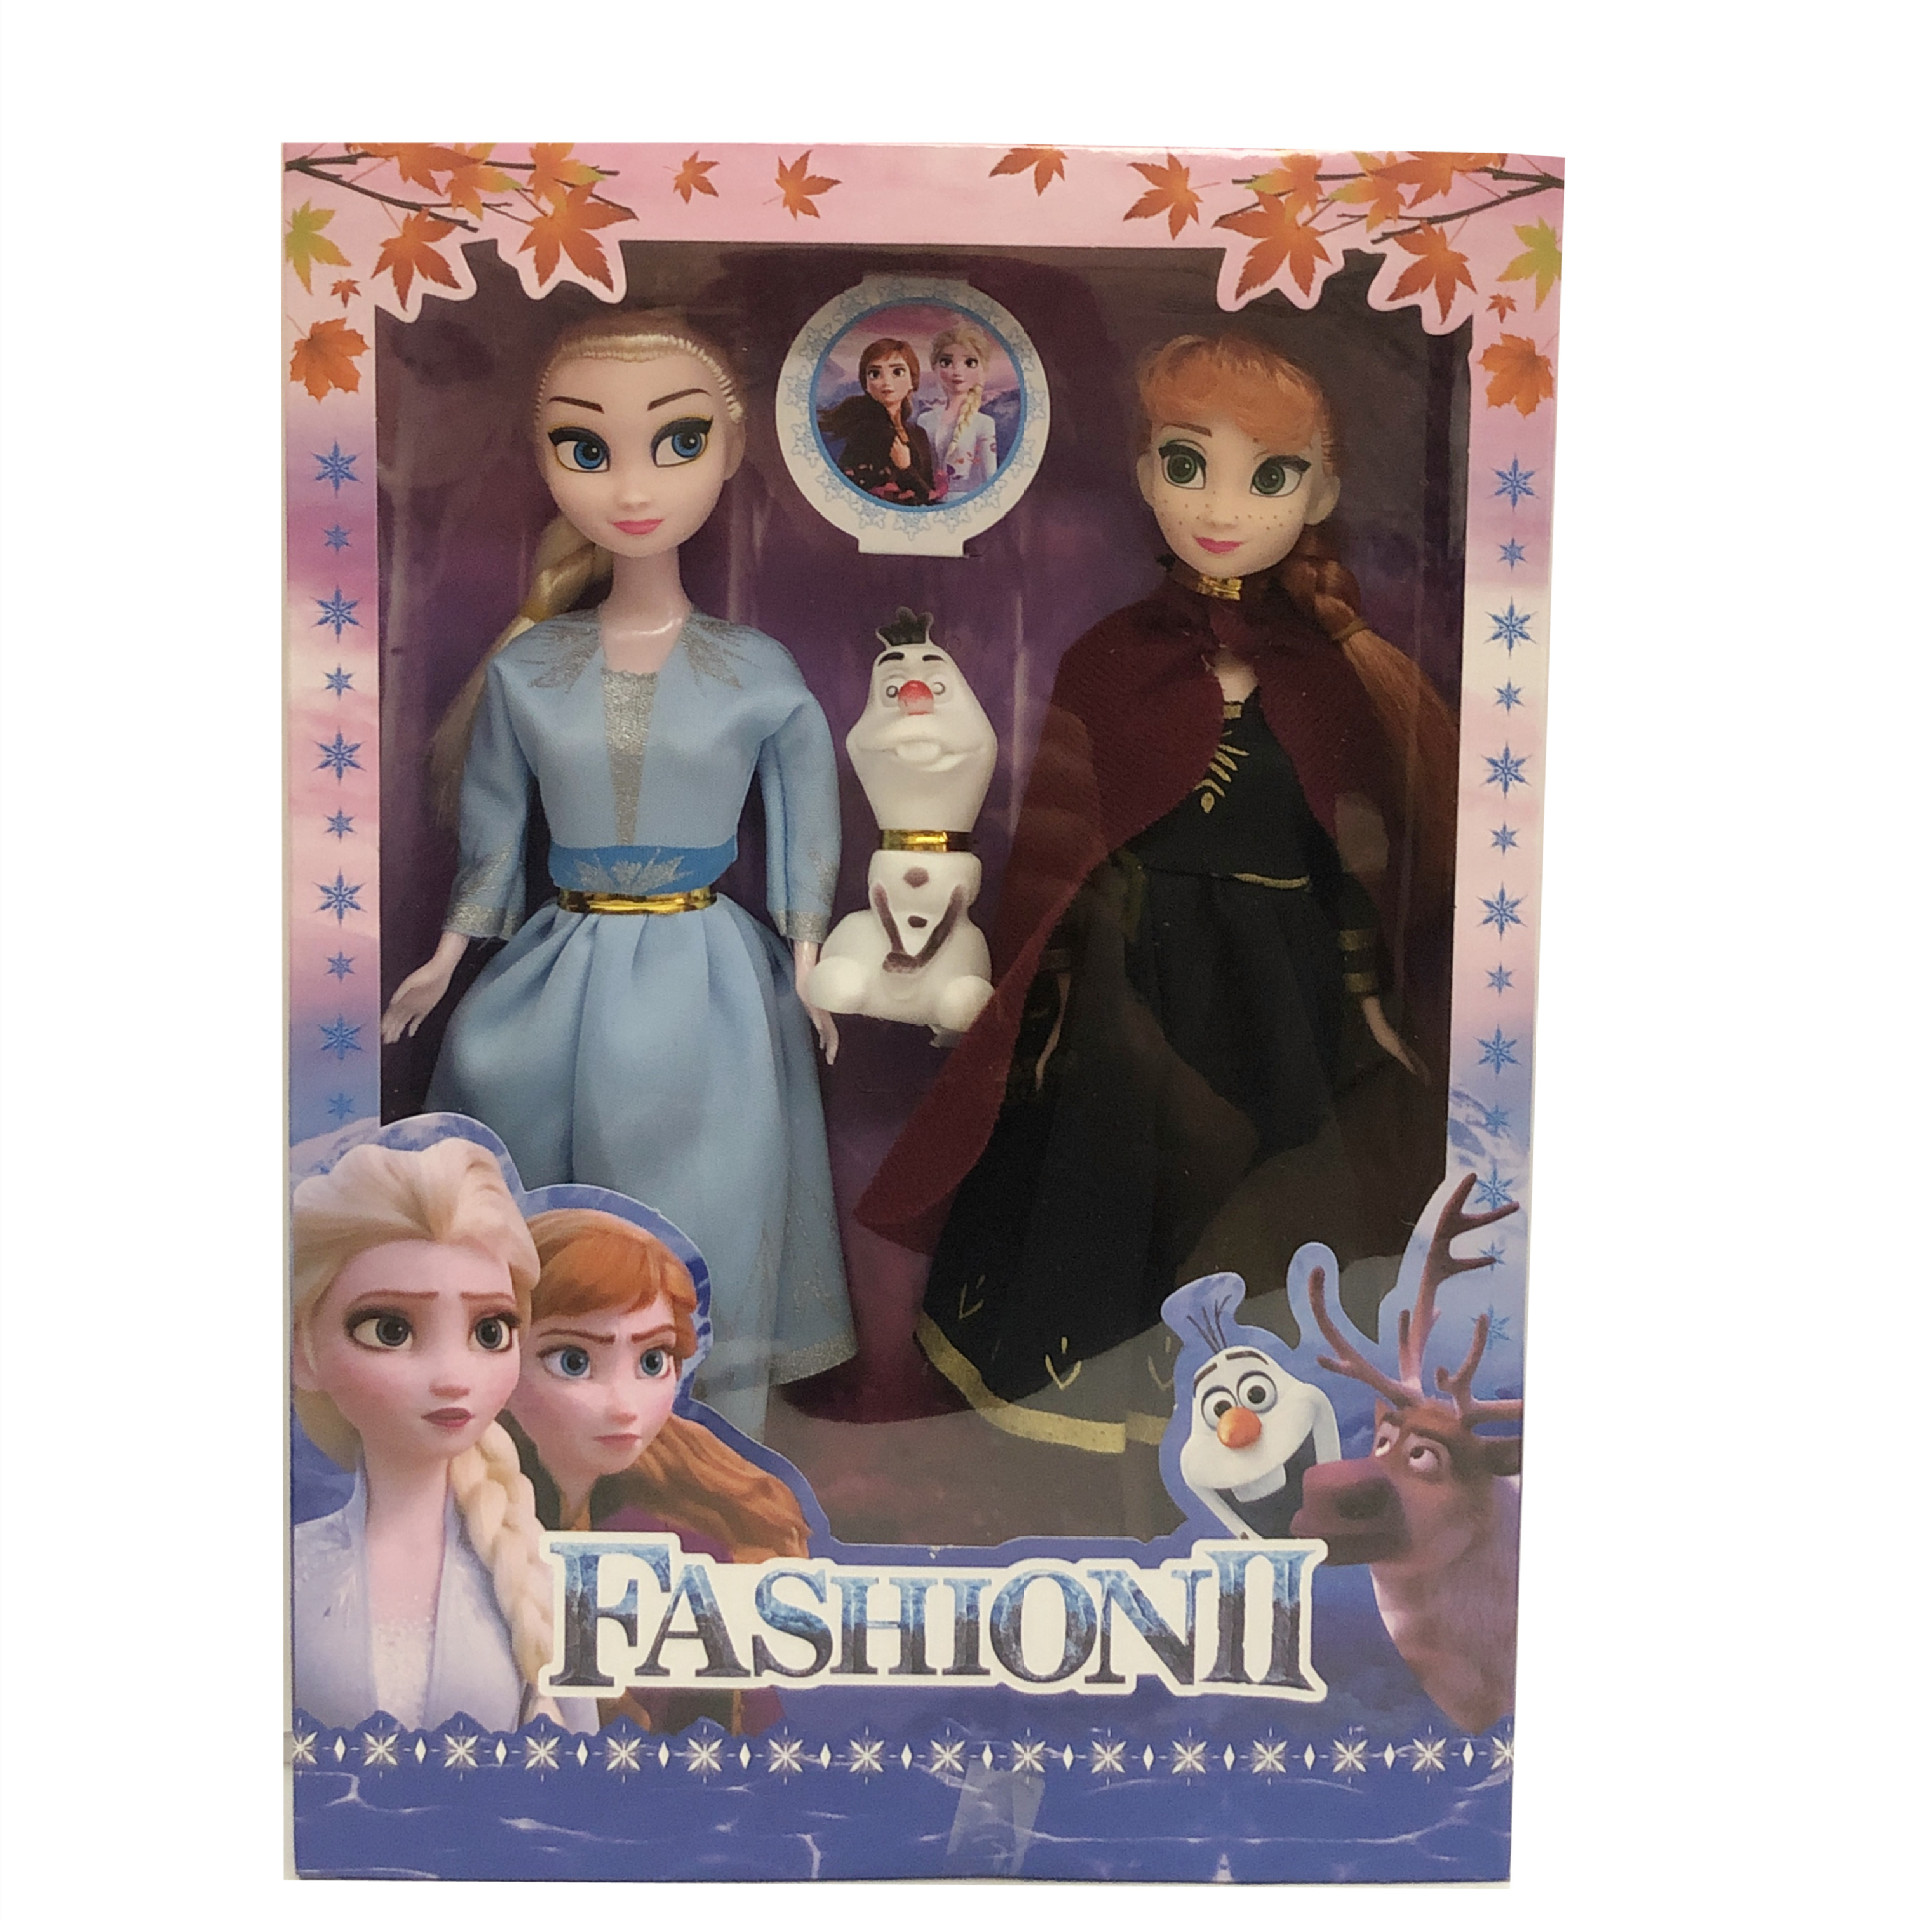 2 un.//set Frozen Princess Elsa//Anna Juguetes Suave Peluche Peluche Muñeco Niños Juguetes de Regalo